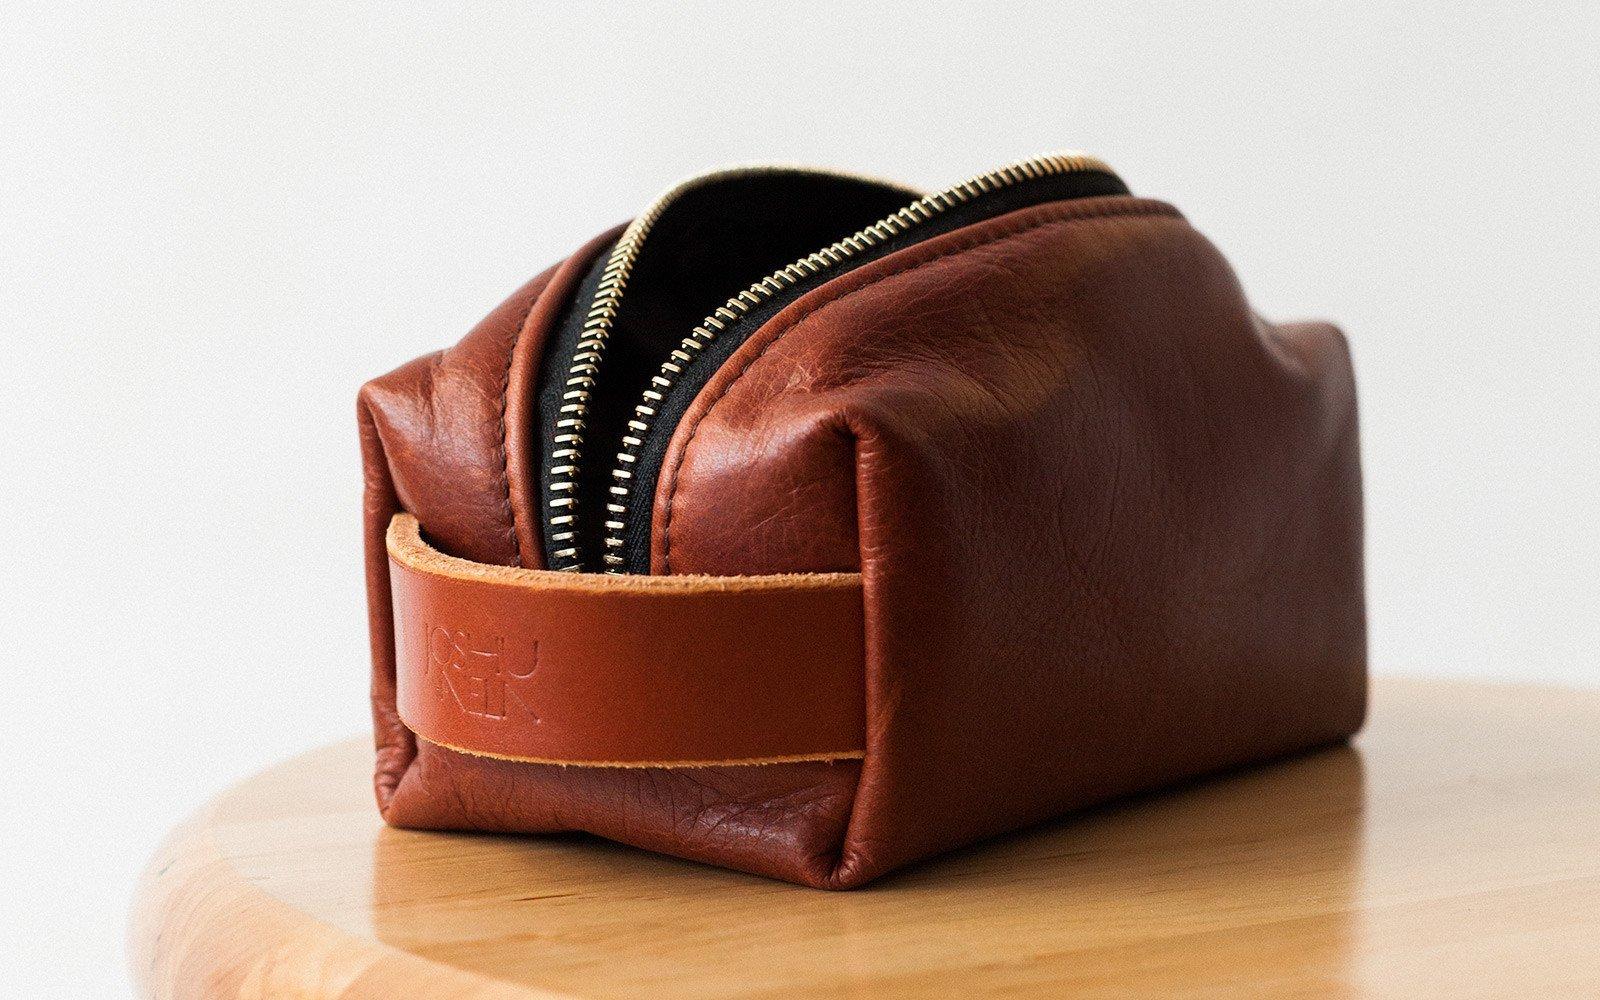 Joshu+Vela Несессер из кожи Dopp Kit Leather Small Brown